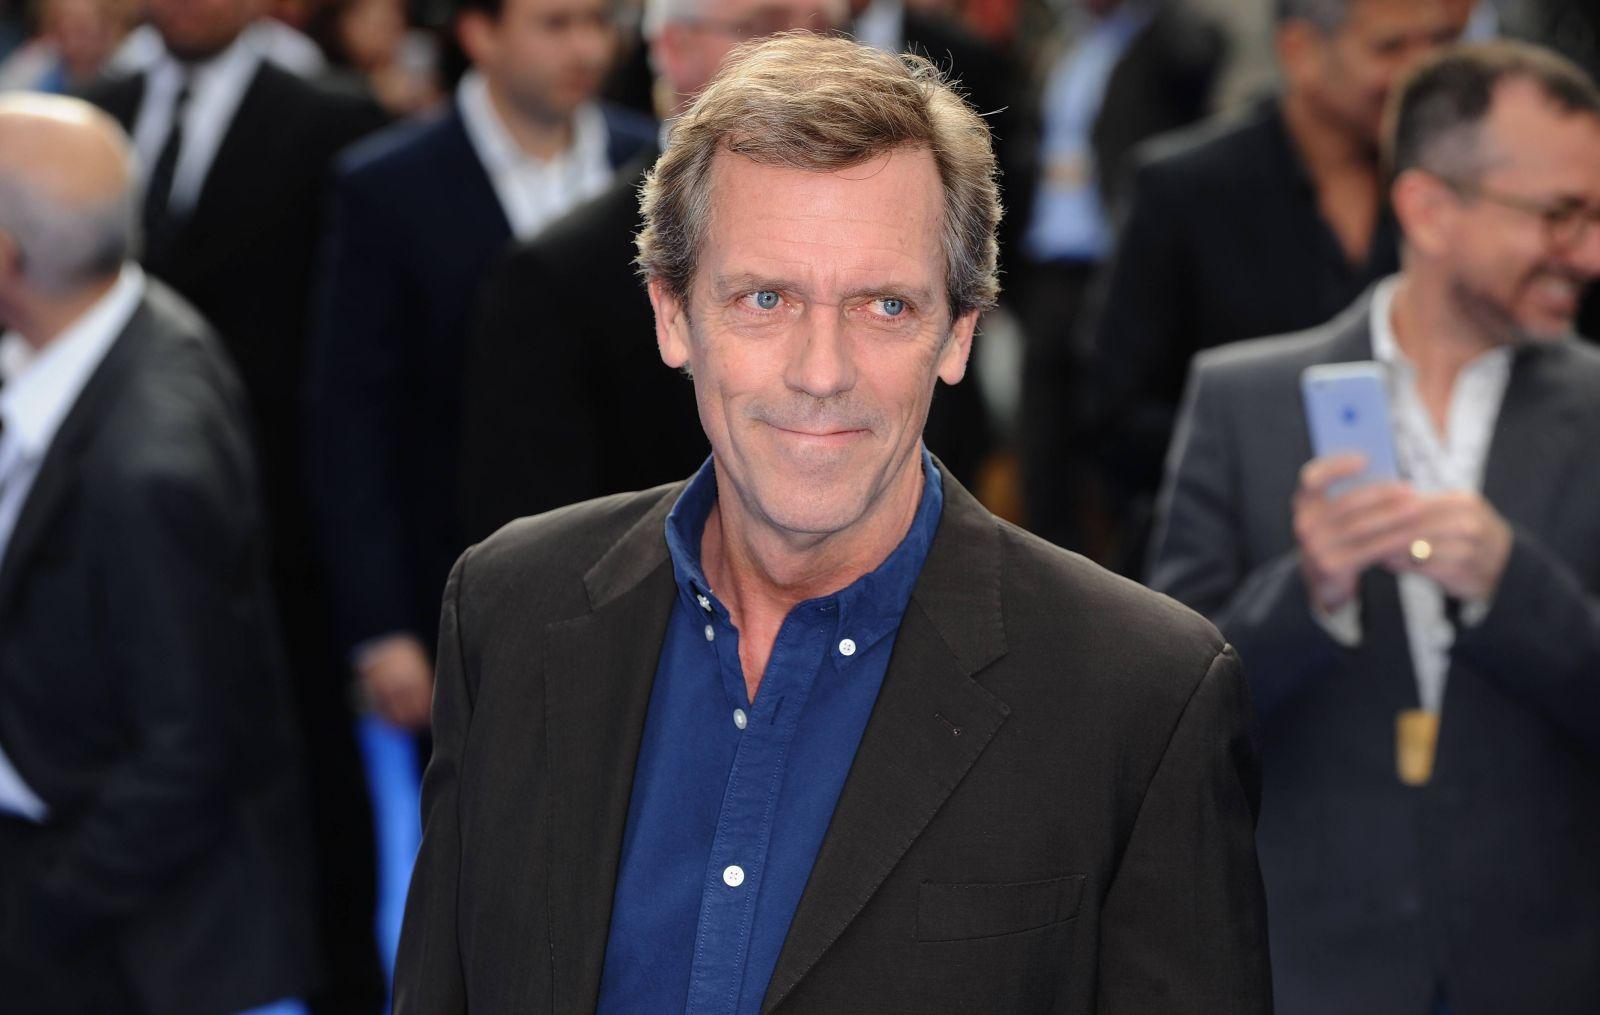 Hugh Laurie21 - Tomorrowland Premiere London 2015.jpg